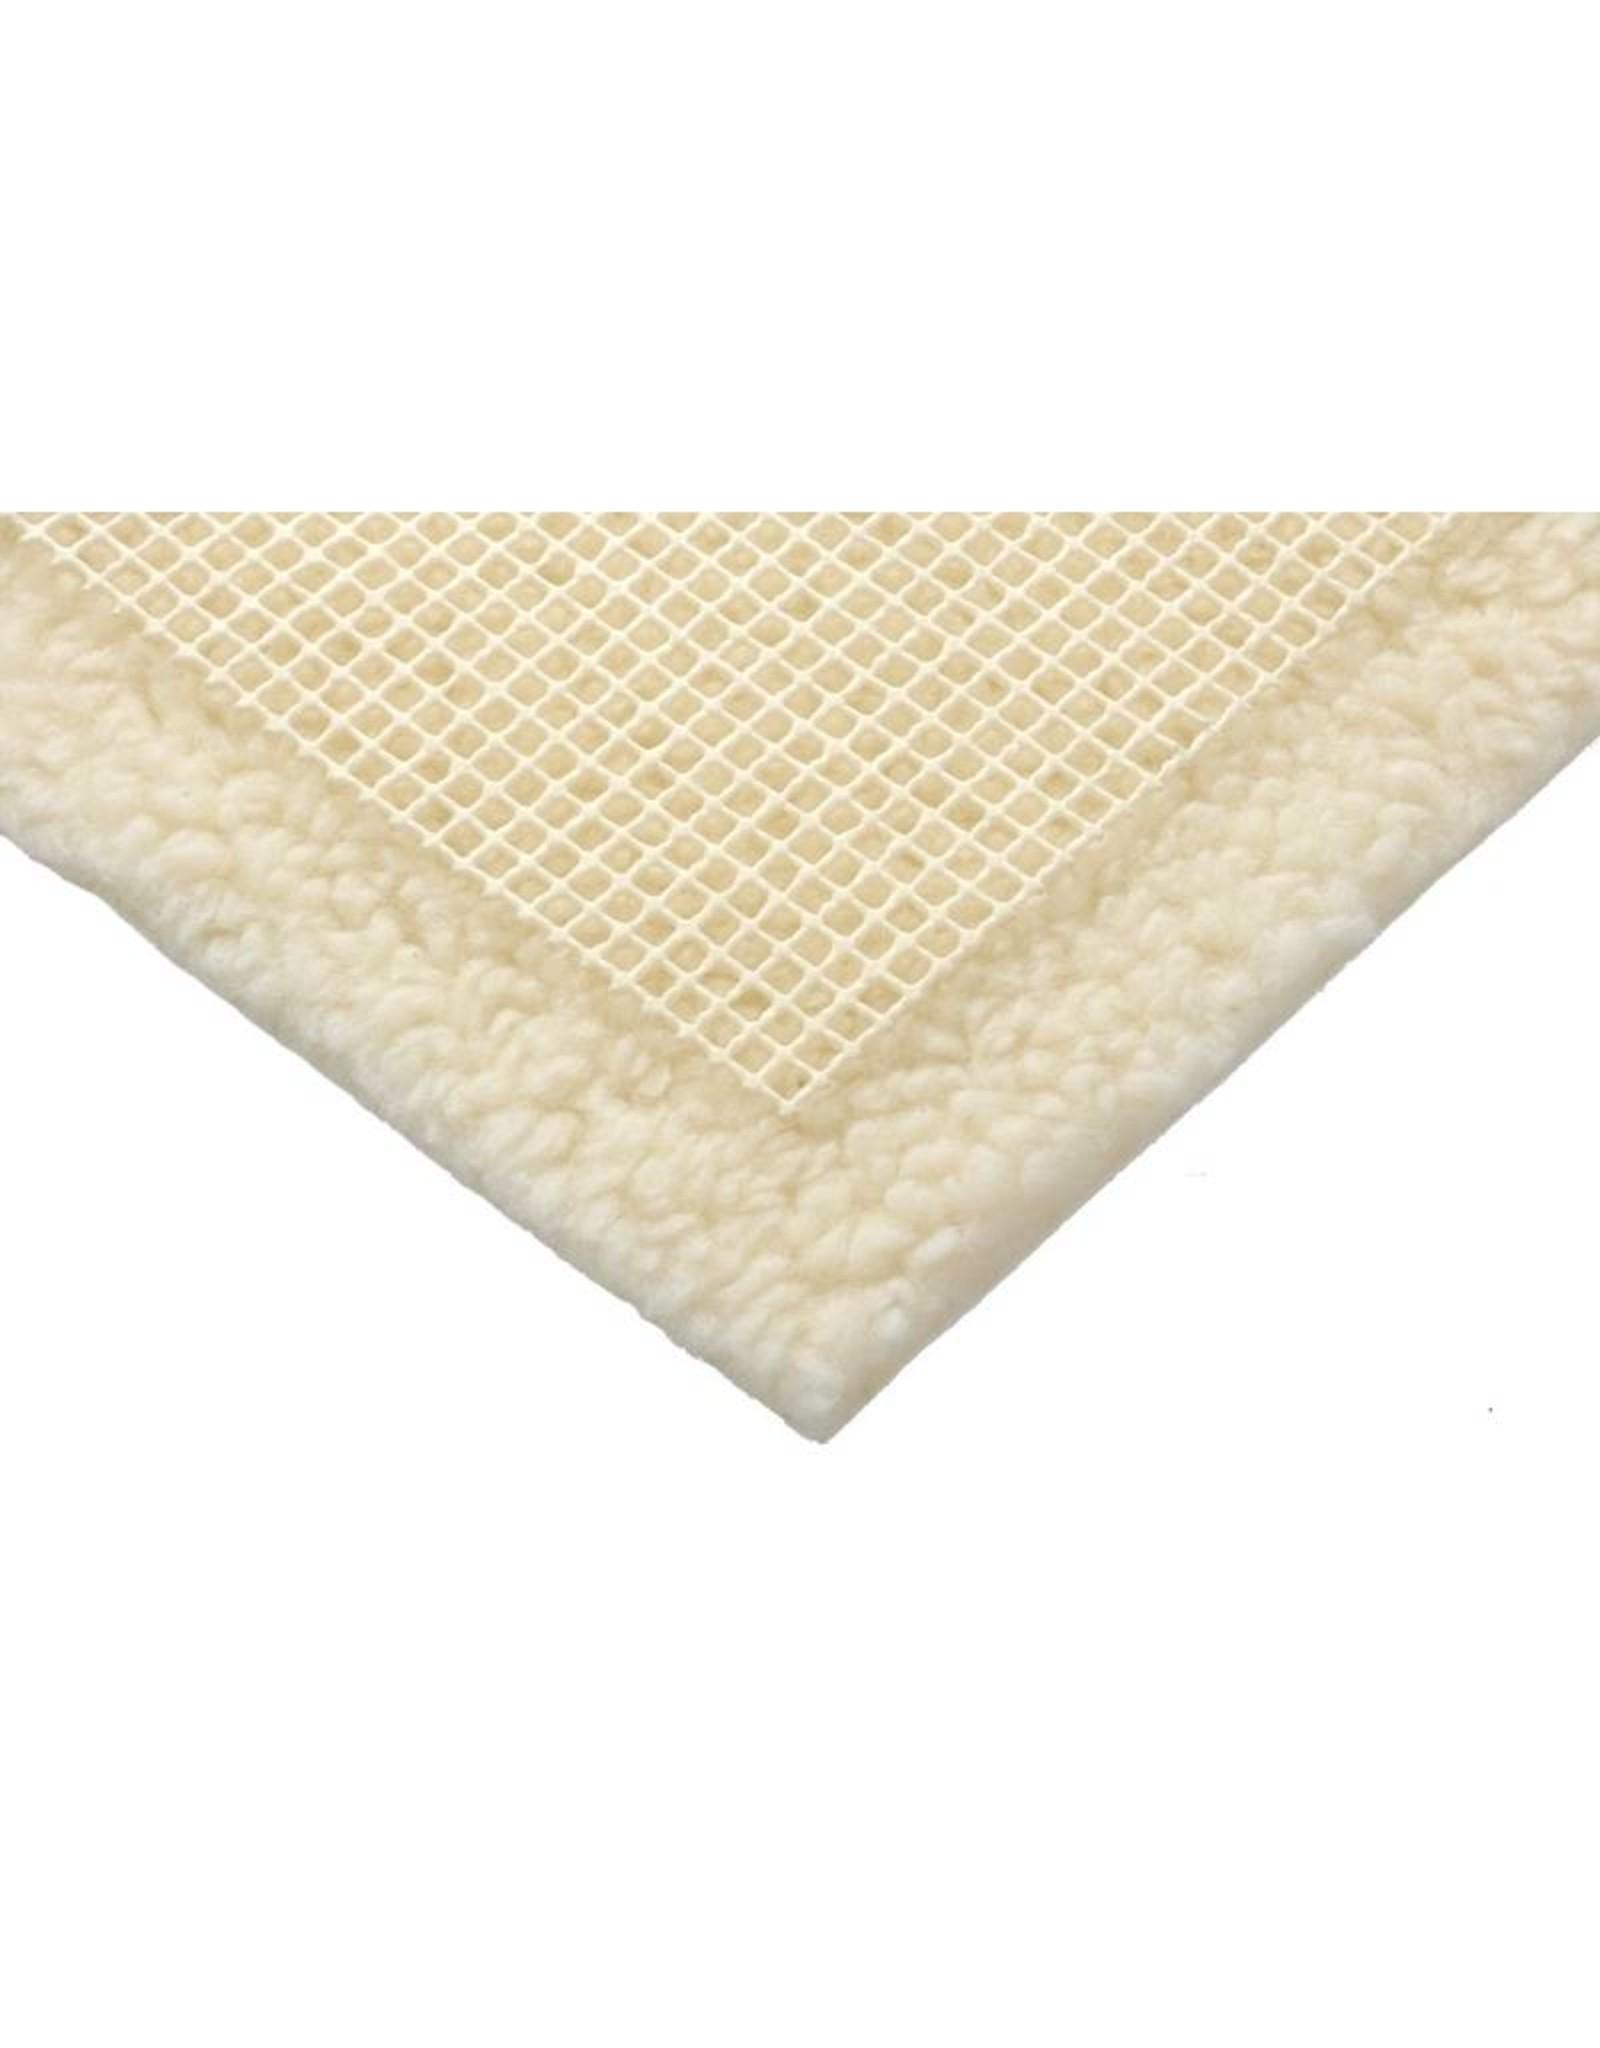 Mani Vivendi Anti-slip dek 60 x 175 voor op de yogamat